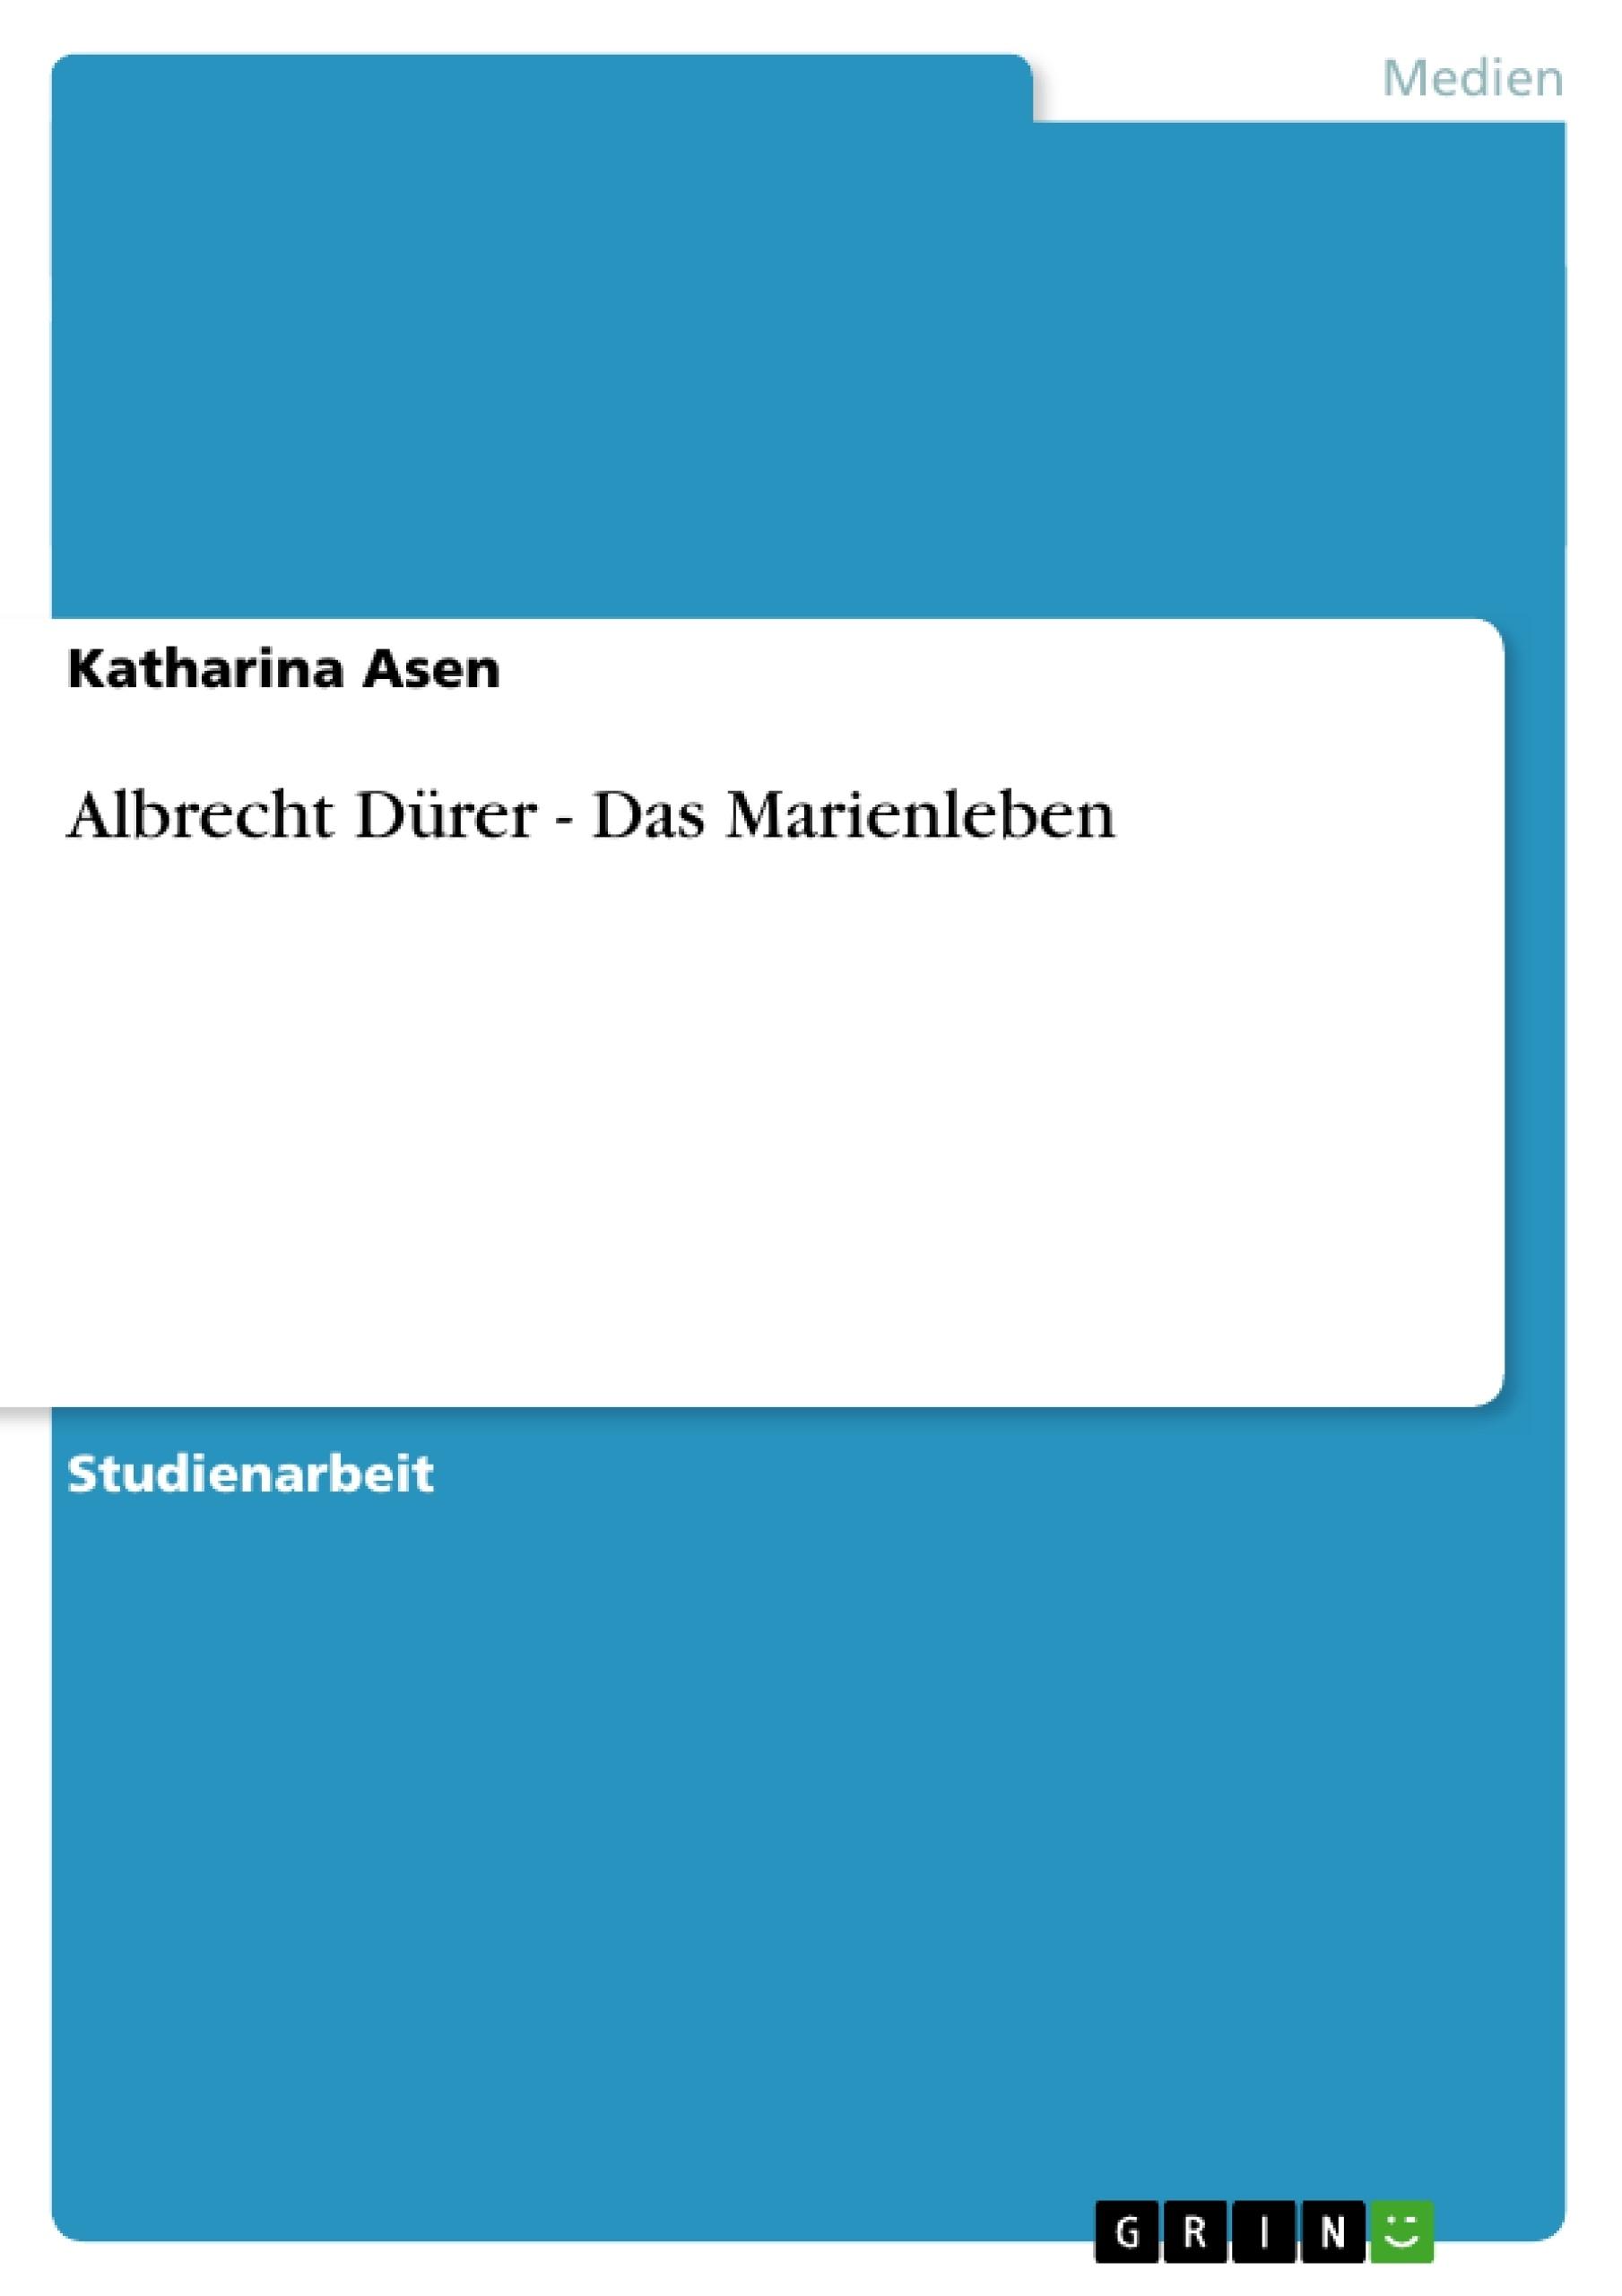 Titel: Albrecht Dürer - Das Marienleben